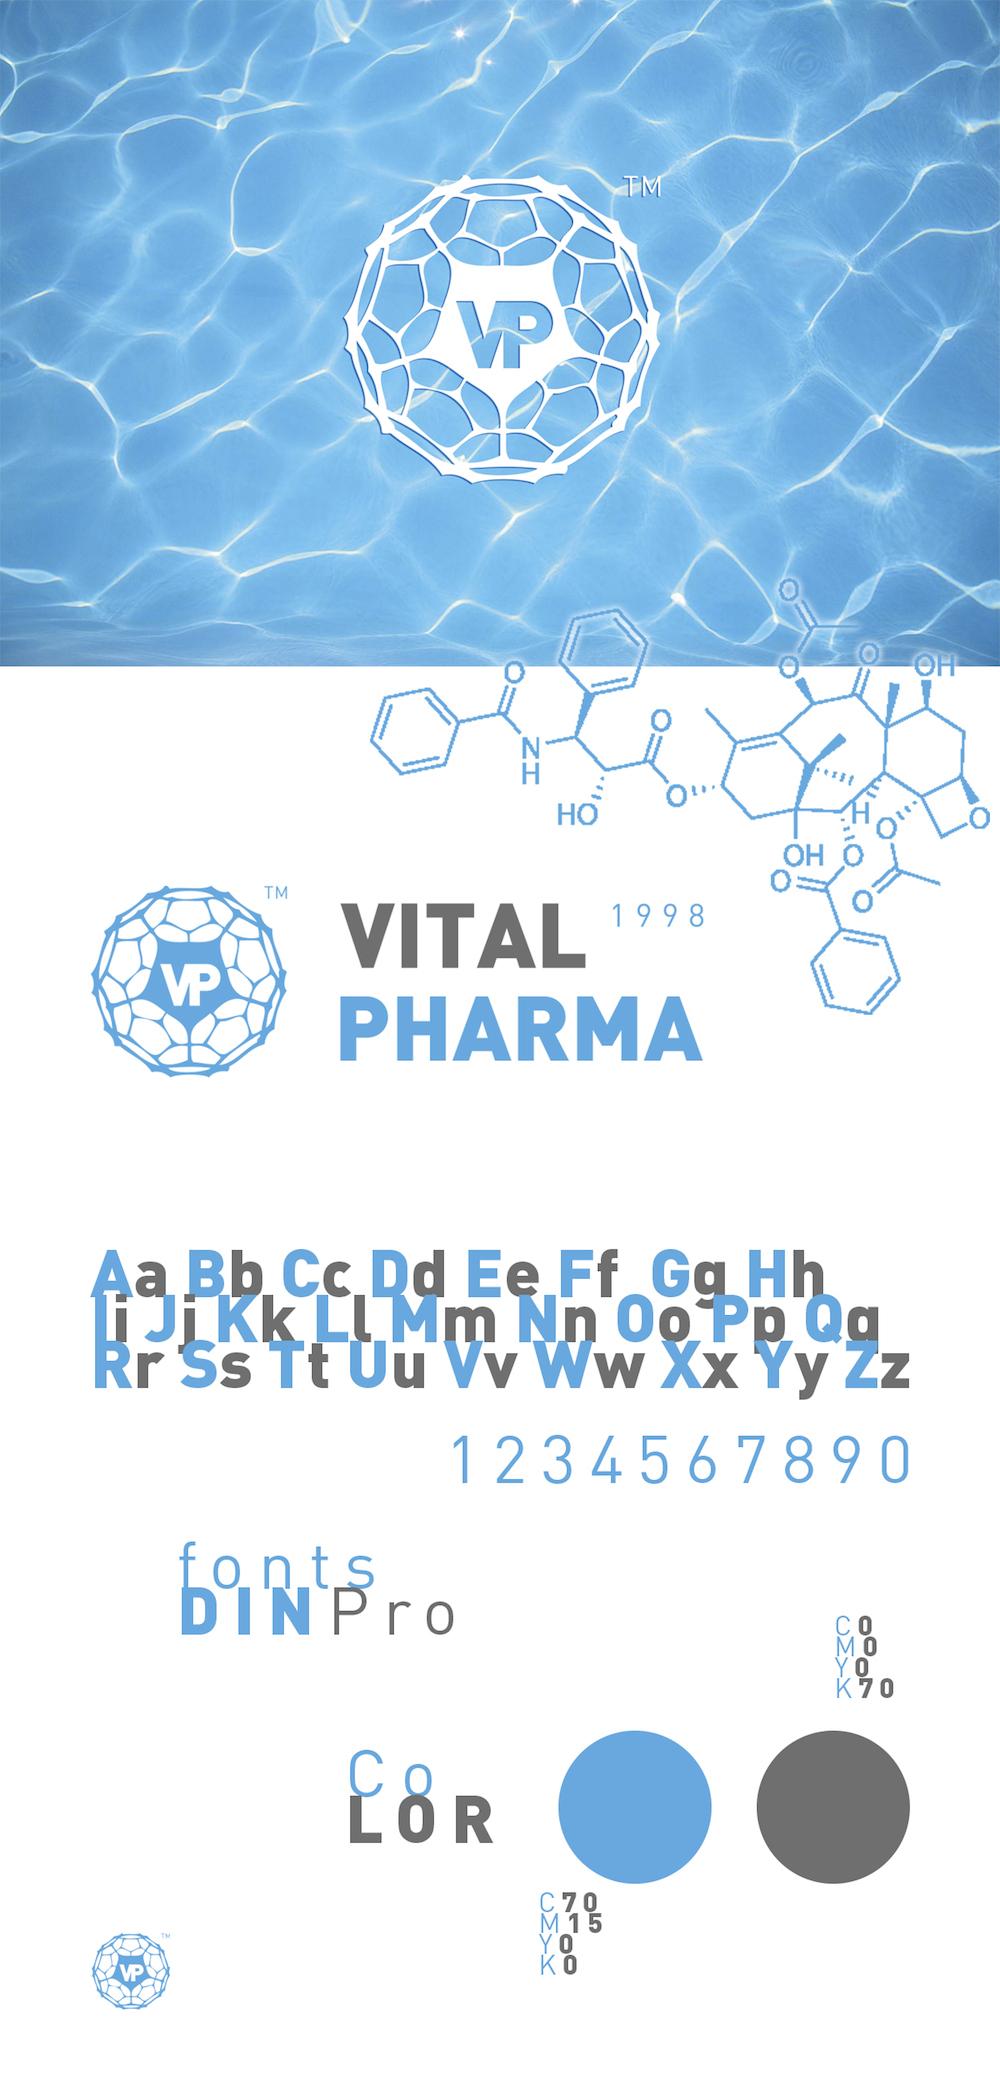 VitalPharma-logo-2